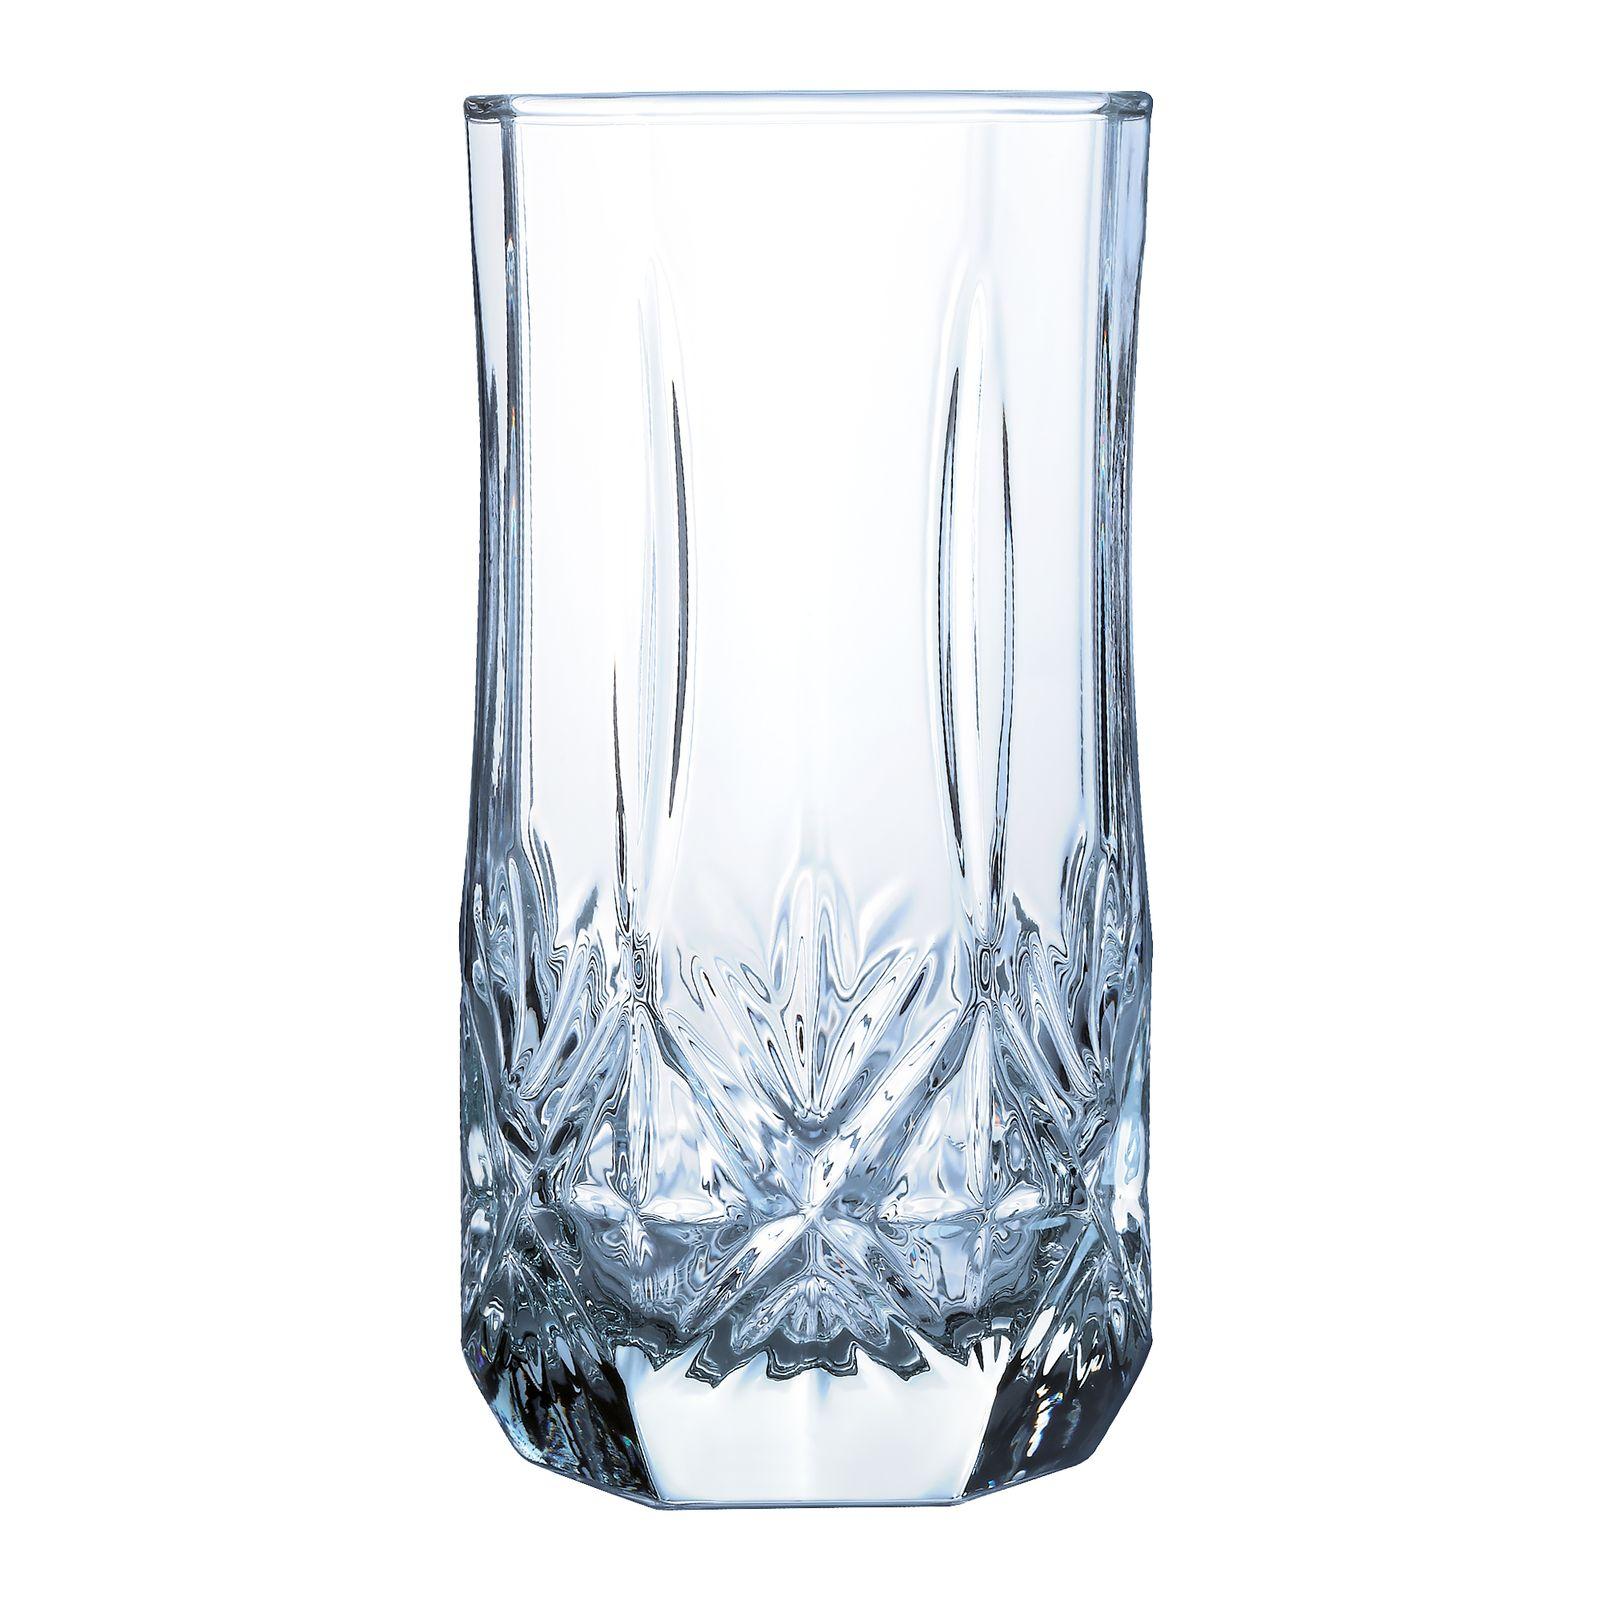 Set of 6 glasses Brighton 310 ml LUMINARC